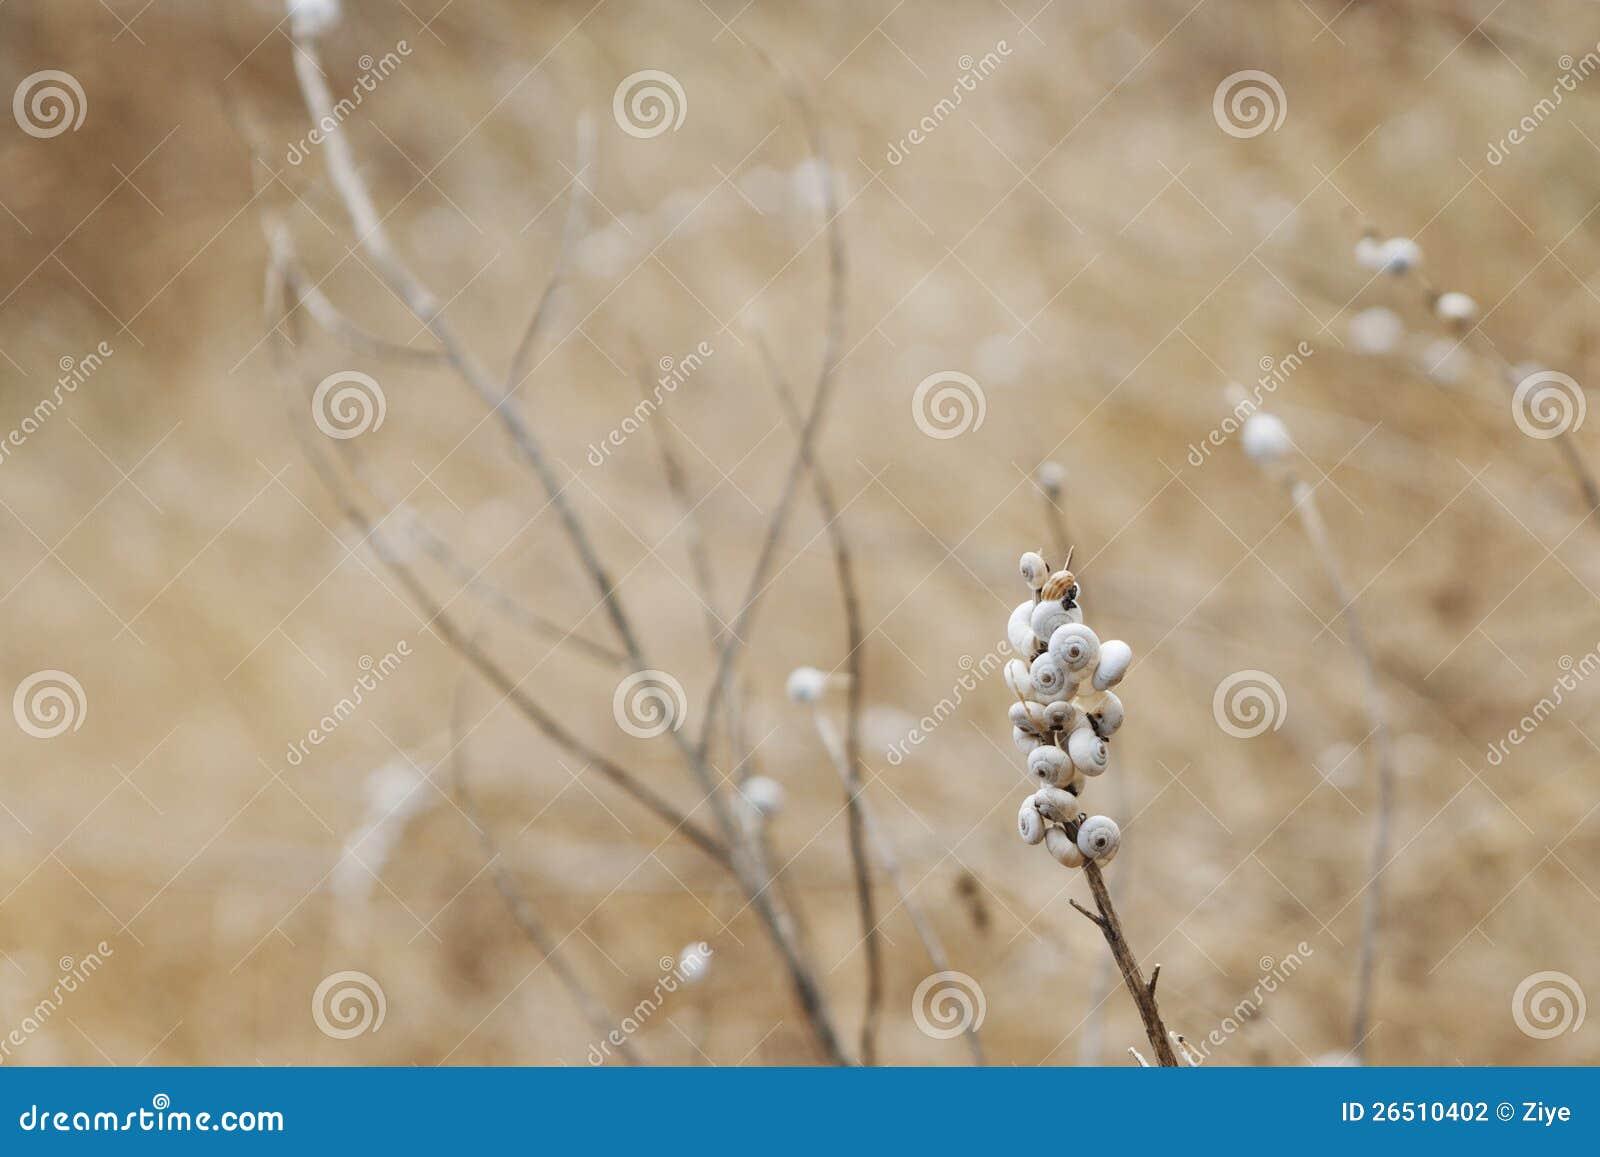 Caracóis minúsculos em plantas